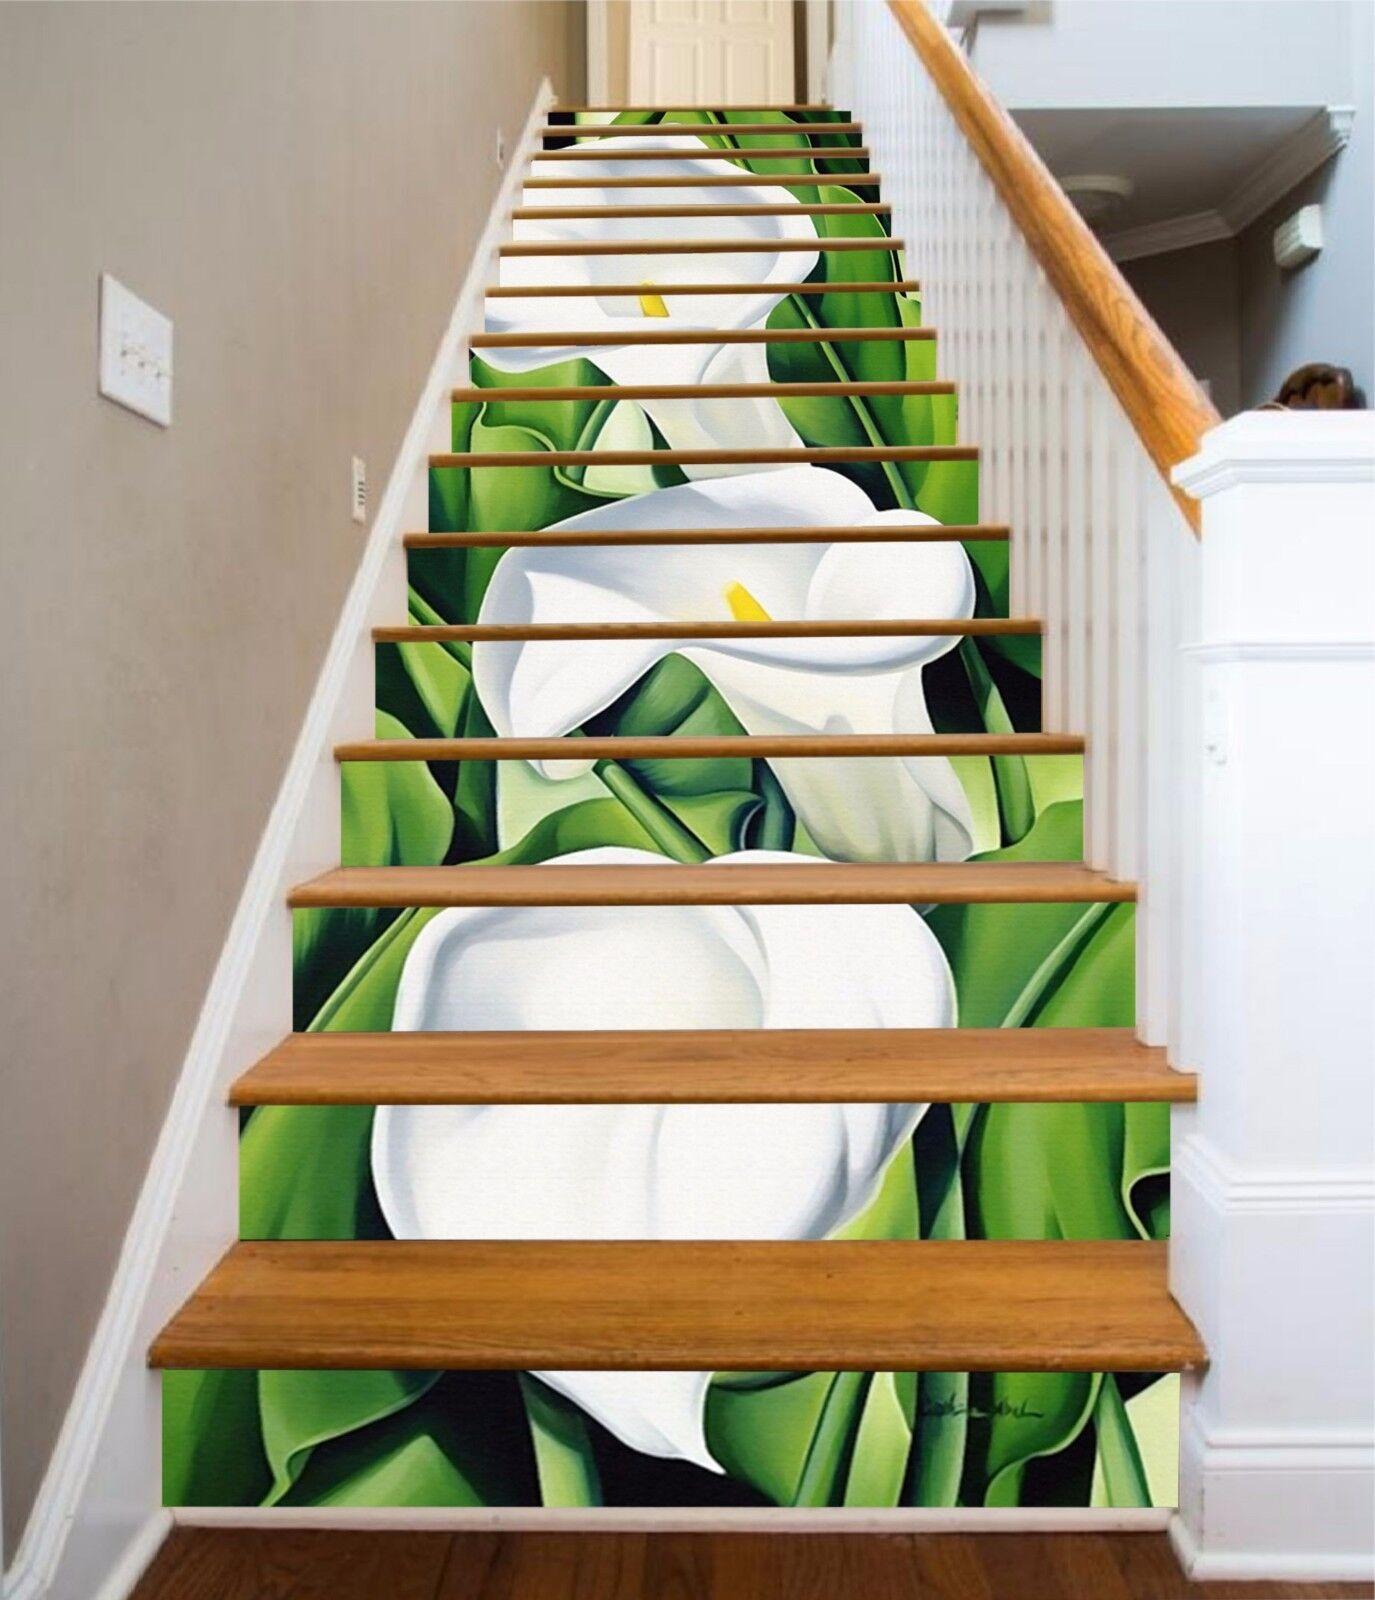 3D Green Leaf 507 Stair Risers Decoration Photo Mural Vinyl Decal Wallpaper AU